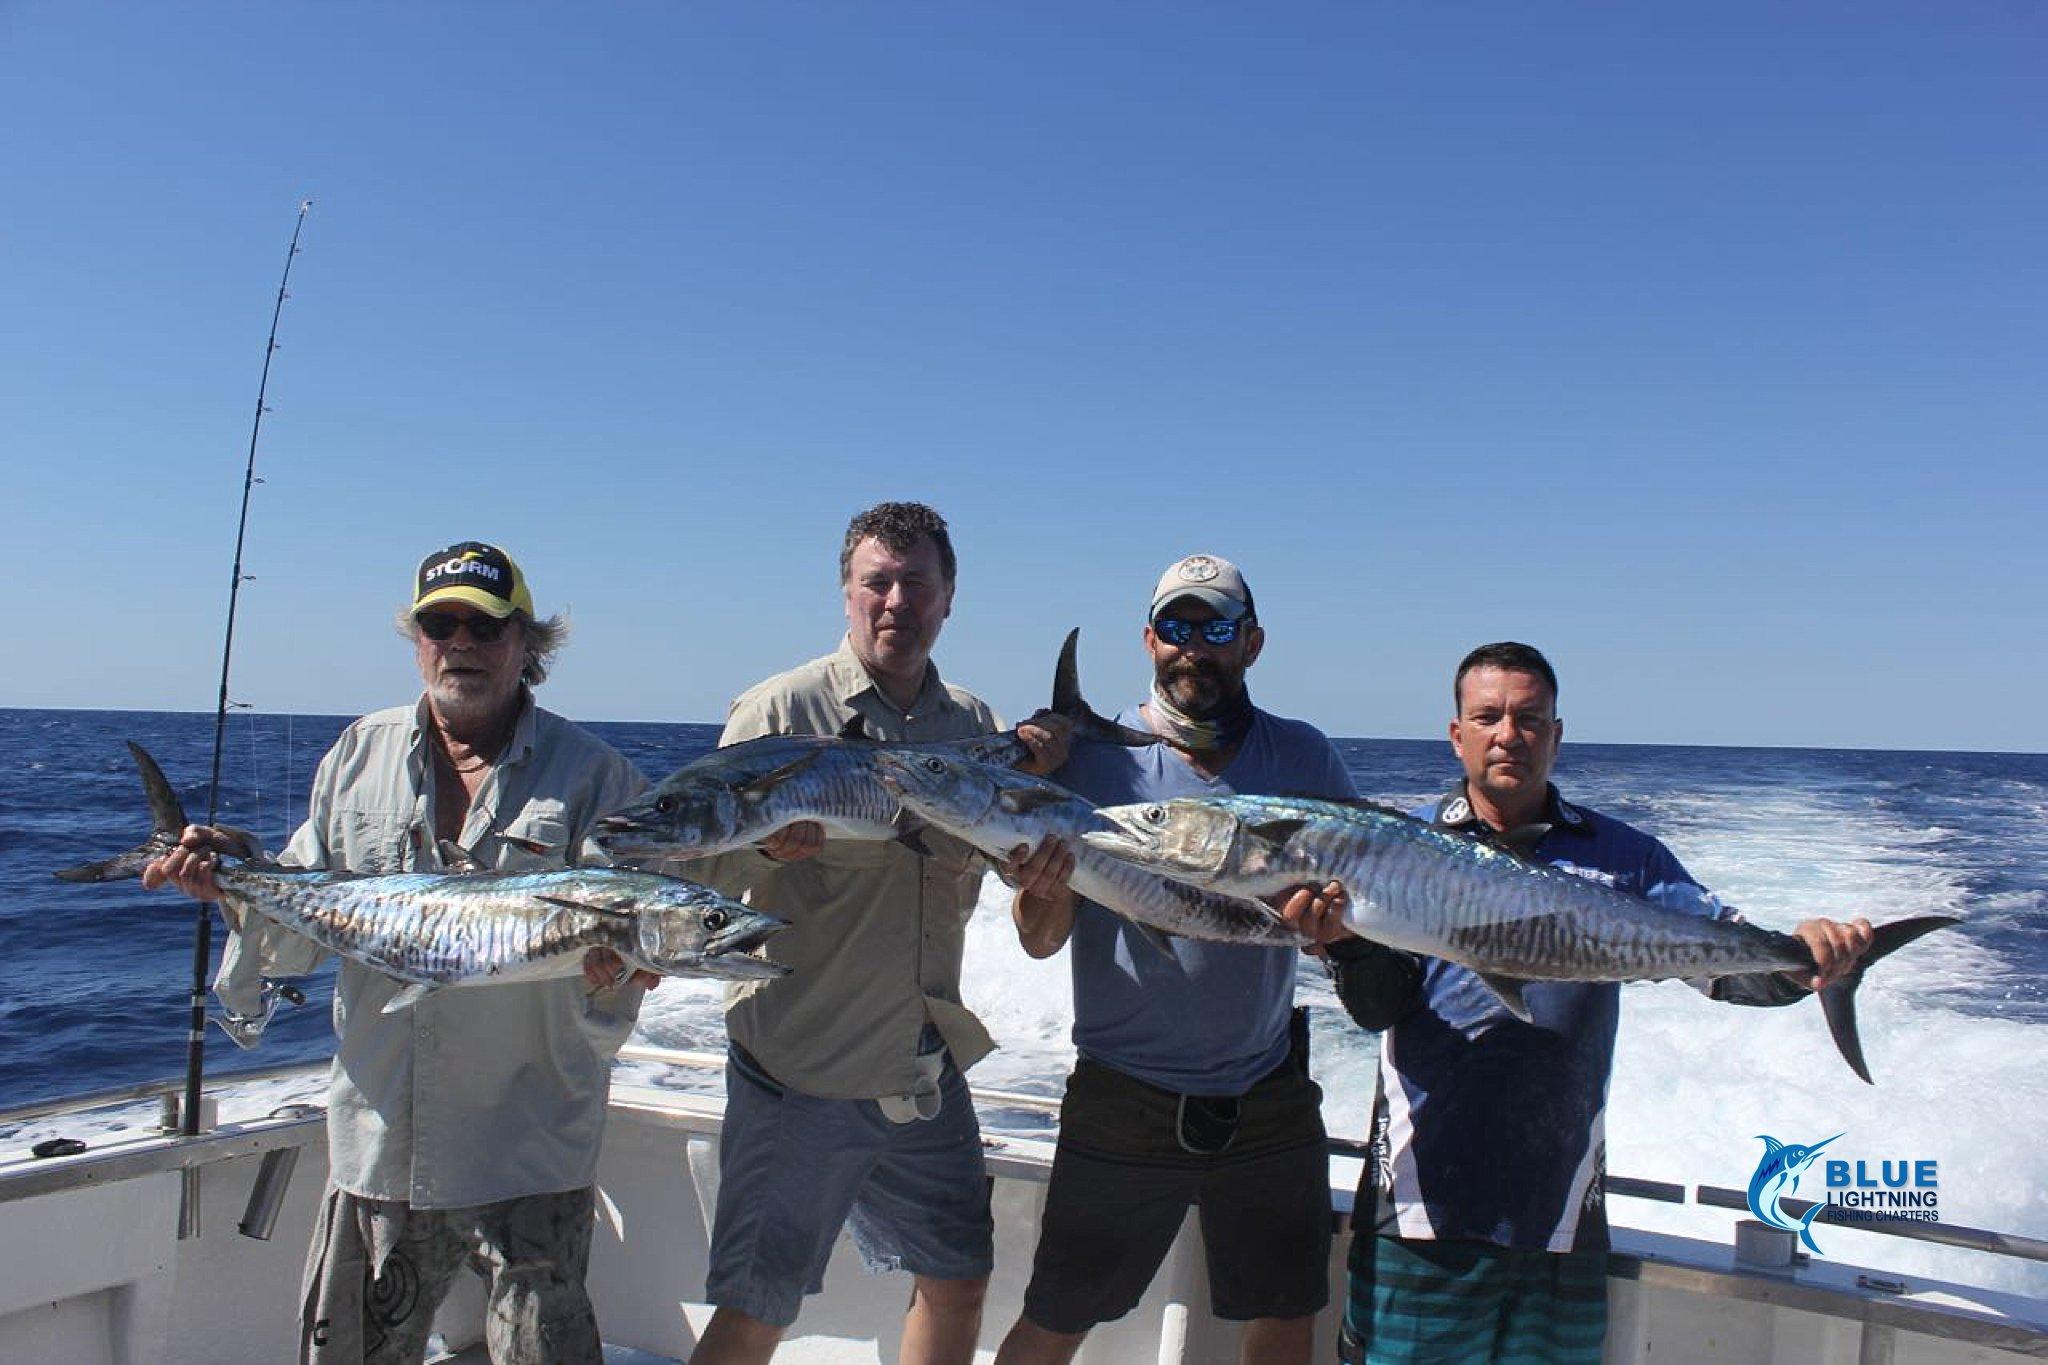 Blue lightning fishing charters wa blue lightning for Wa fishing charters